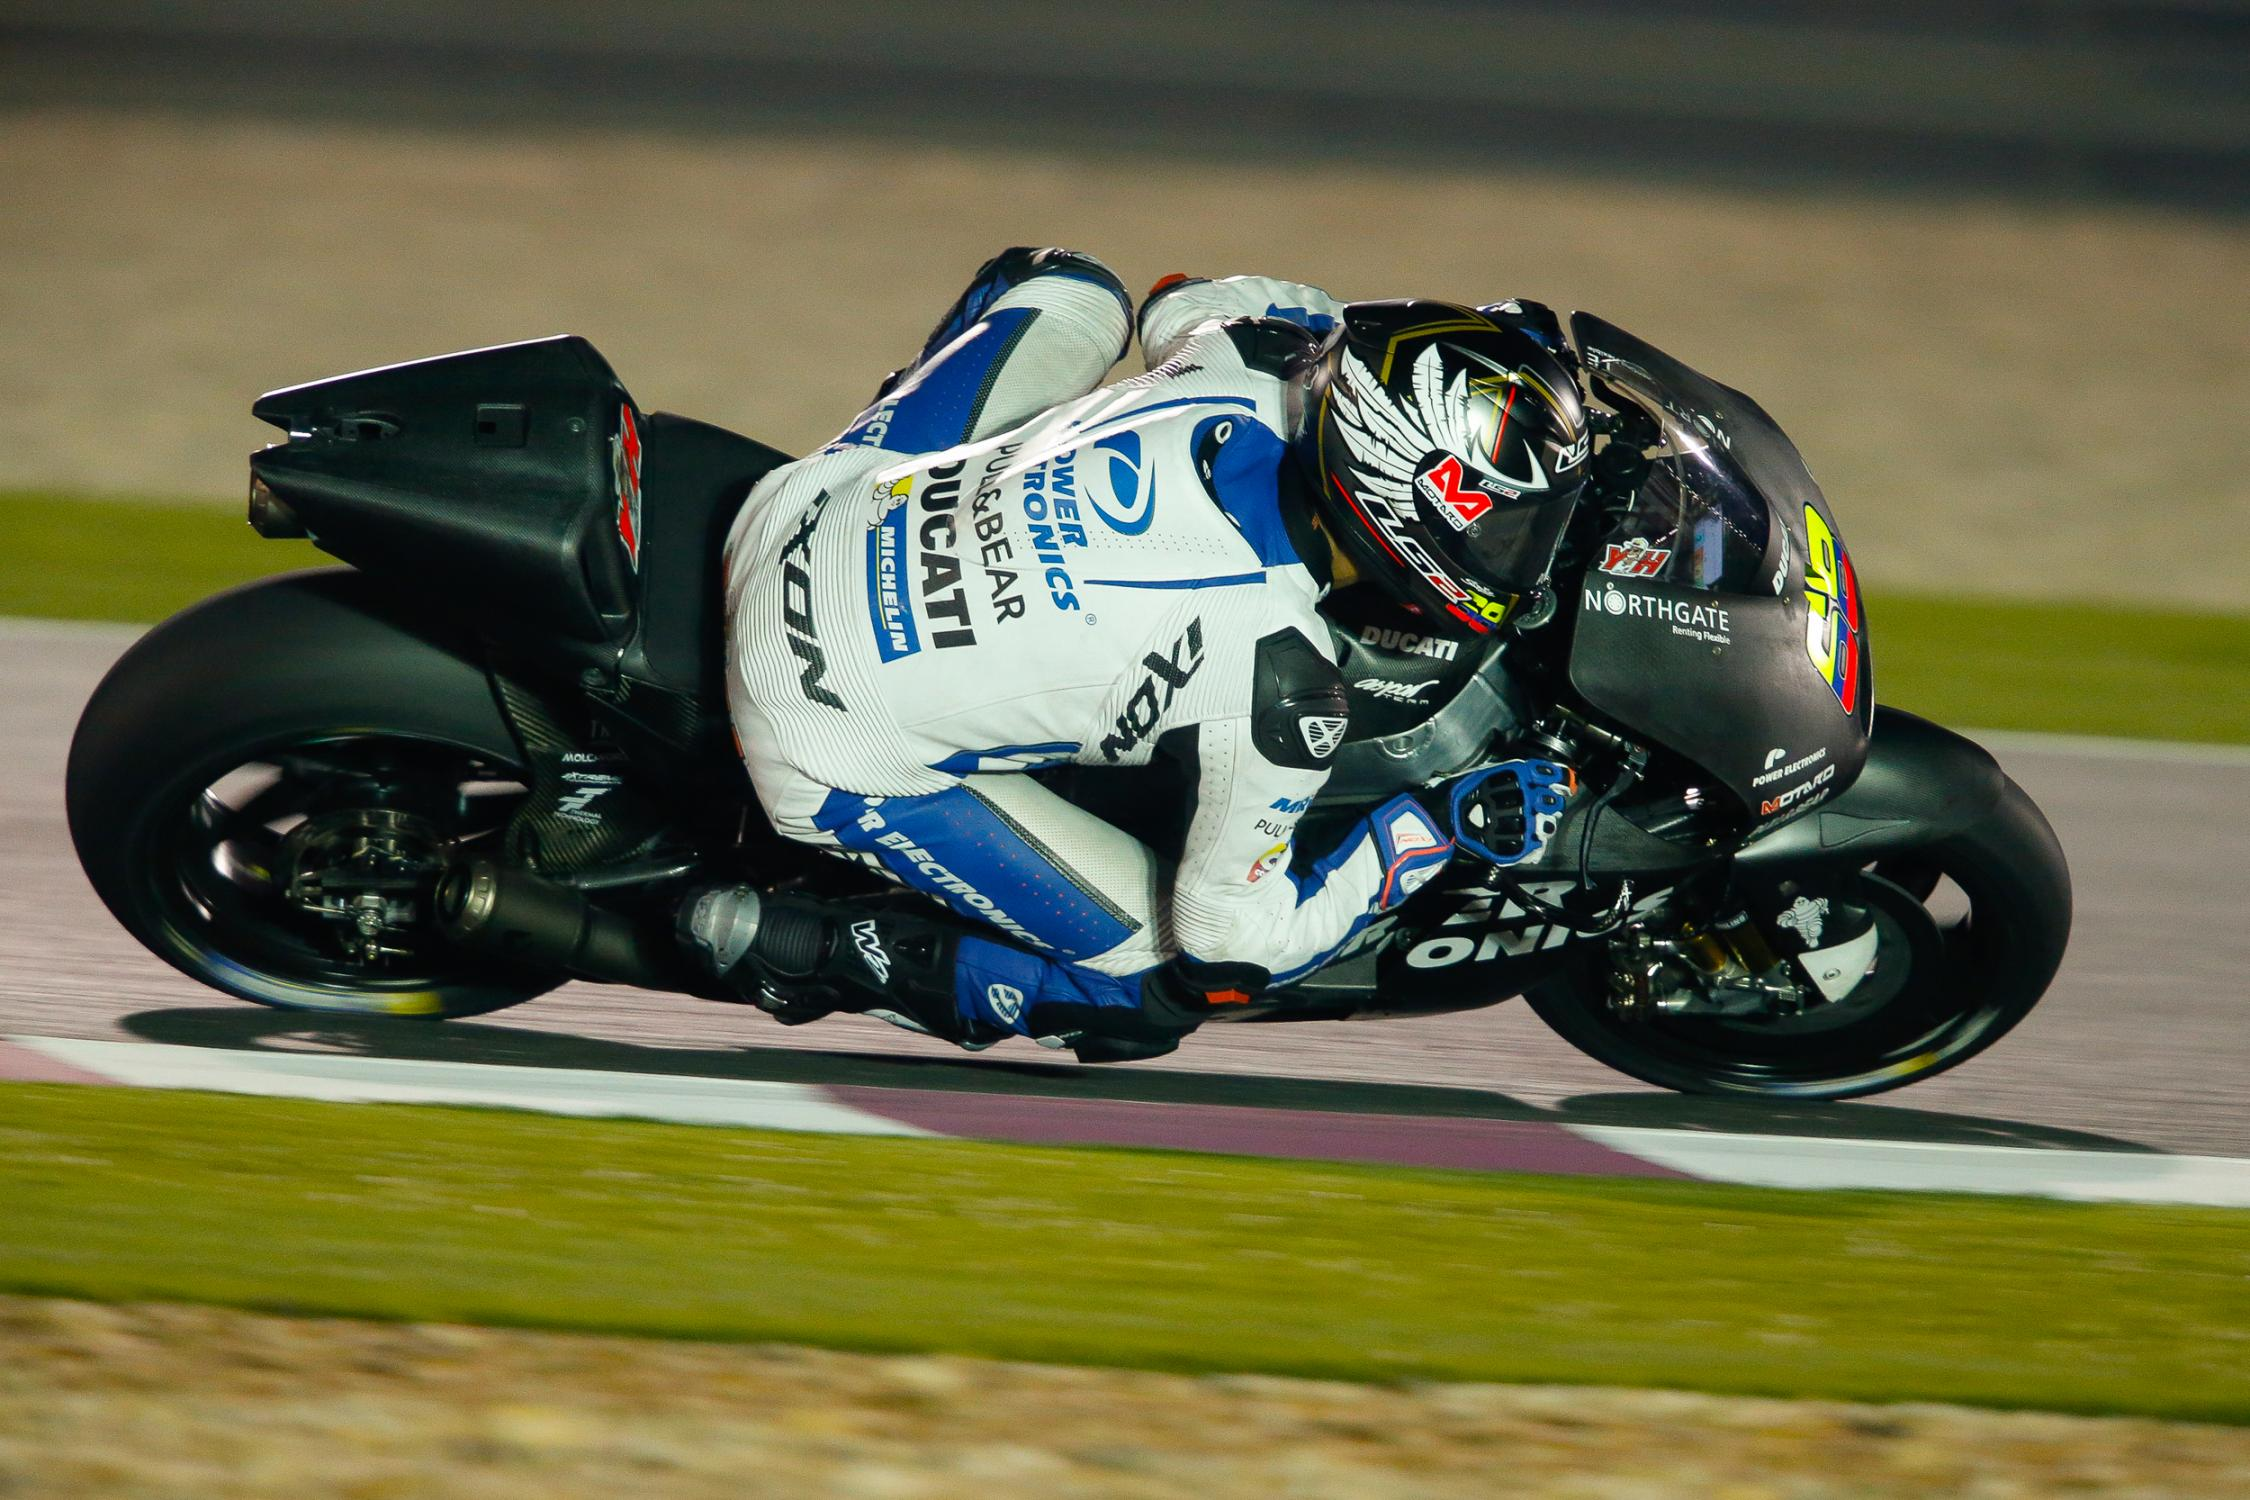 Test MotoGP Qatar 2016 68-hernandez_gp_4879.gallery_full_top_fullscreen